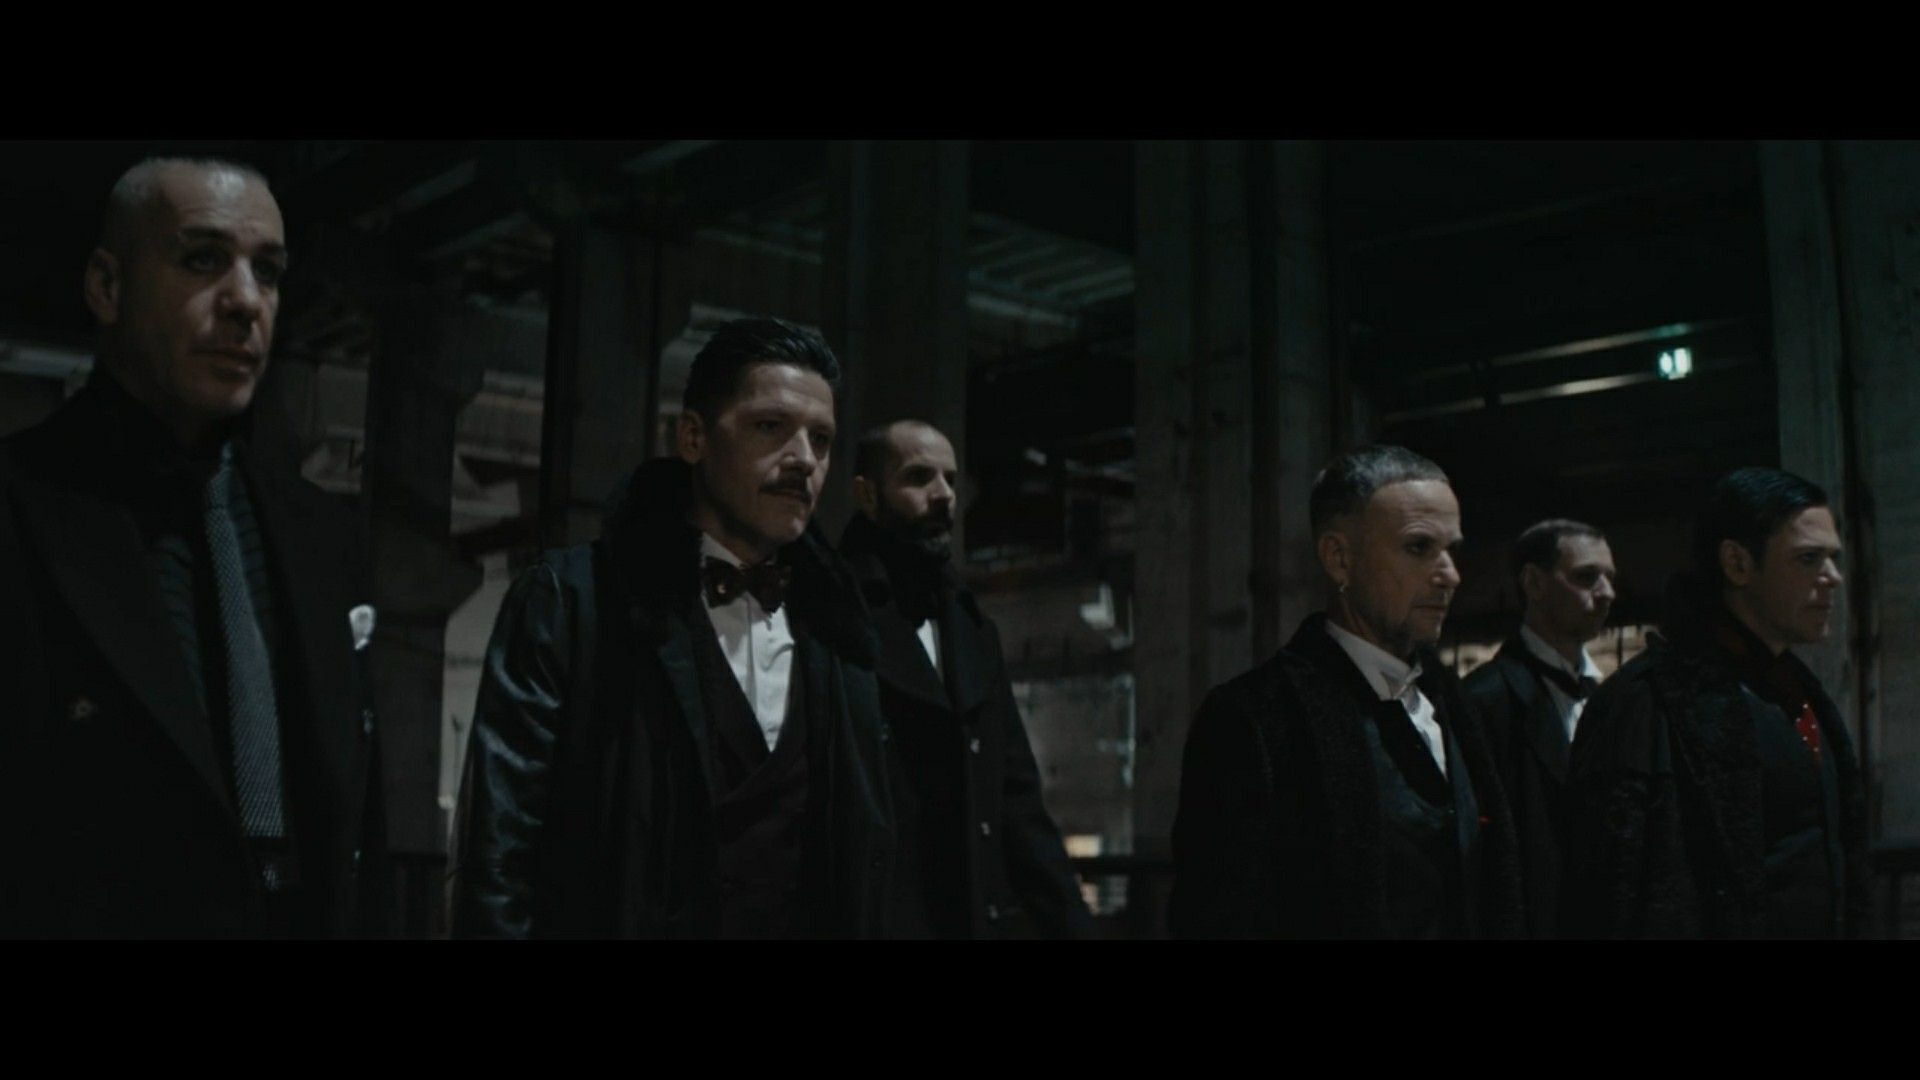 Rammstein Rammstein Gruppenfoto Till Lindemann